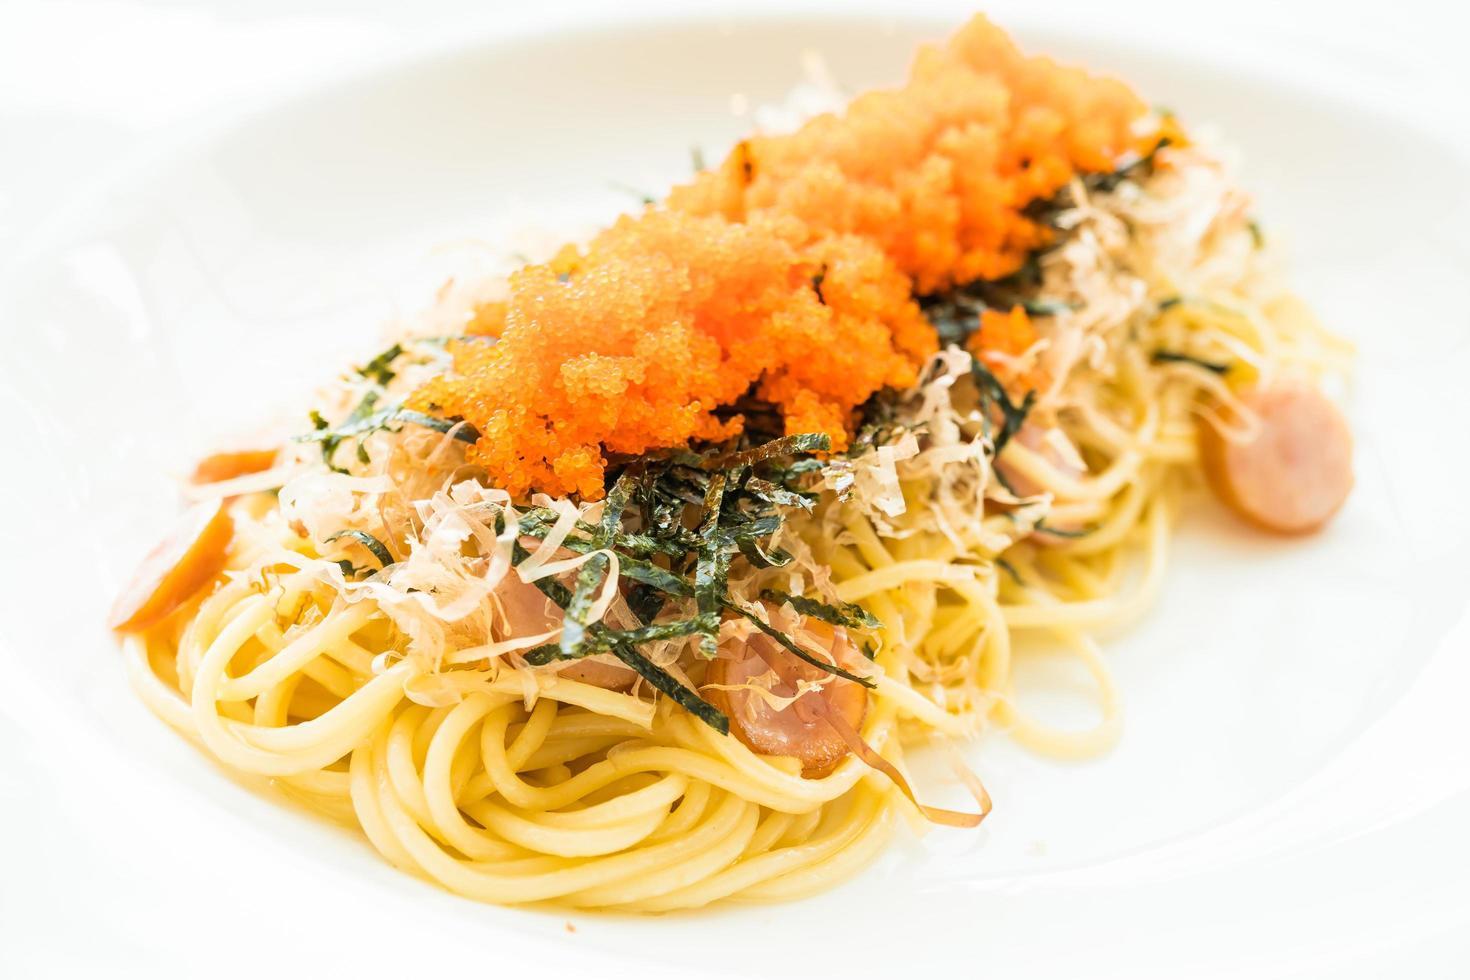 Spaghetti mit Wurst, Garnelenei, Seetang, trockenem Tintenfisch foto